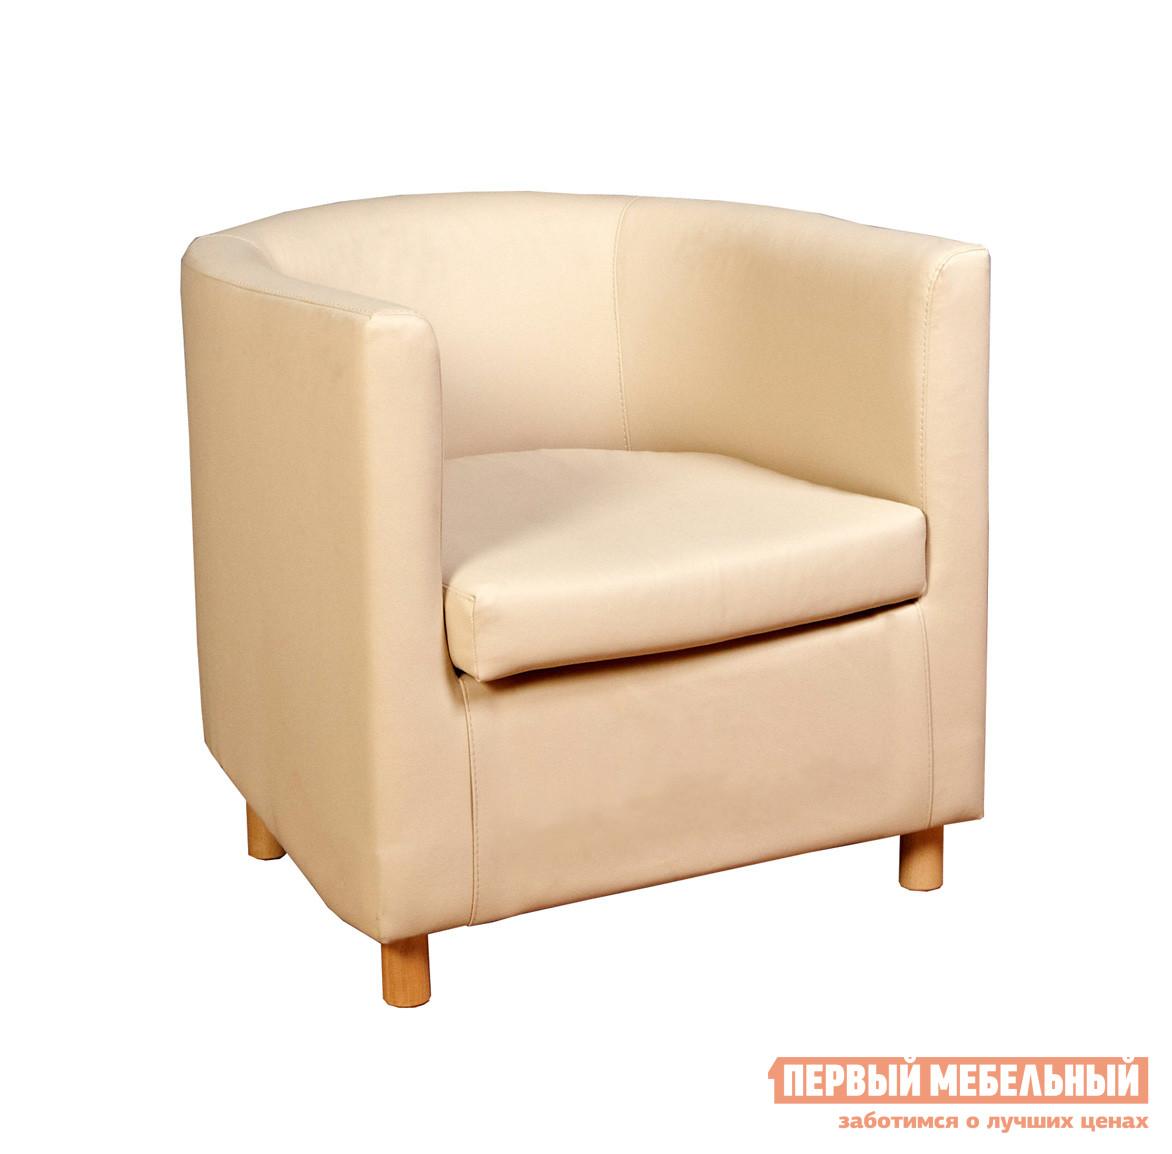 Кресло СМК Дисо 3 042.08 1х К/з Орегон 3023